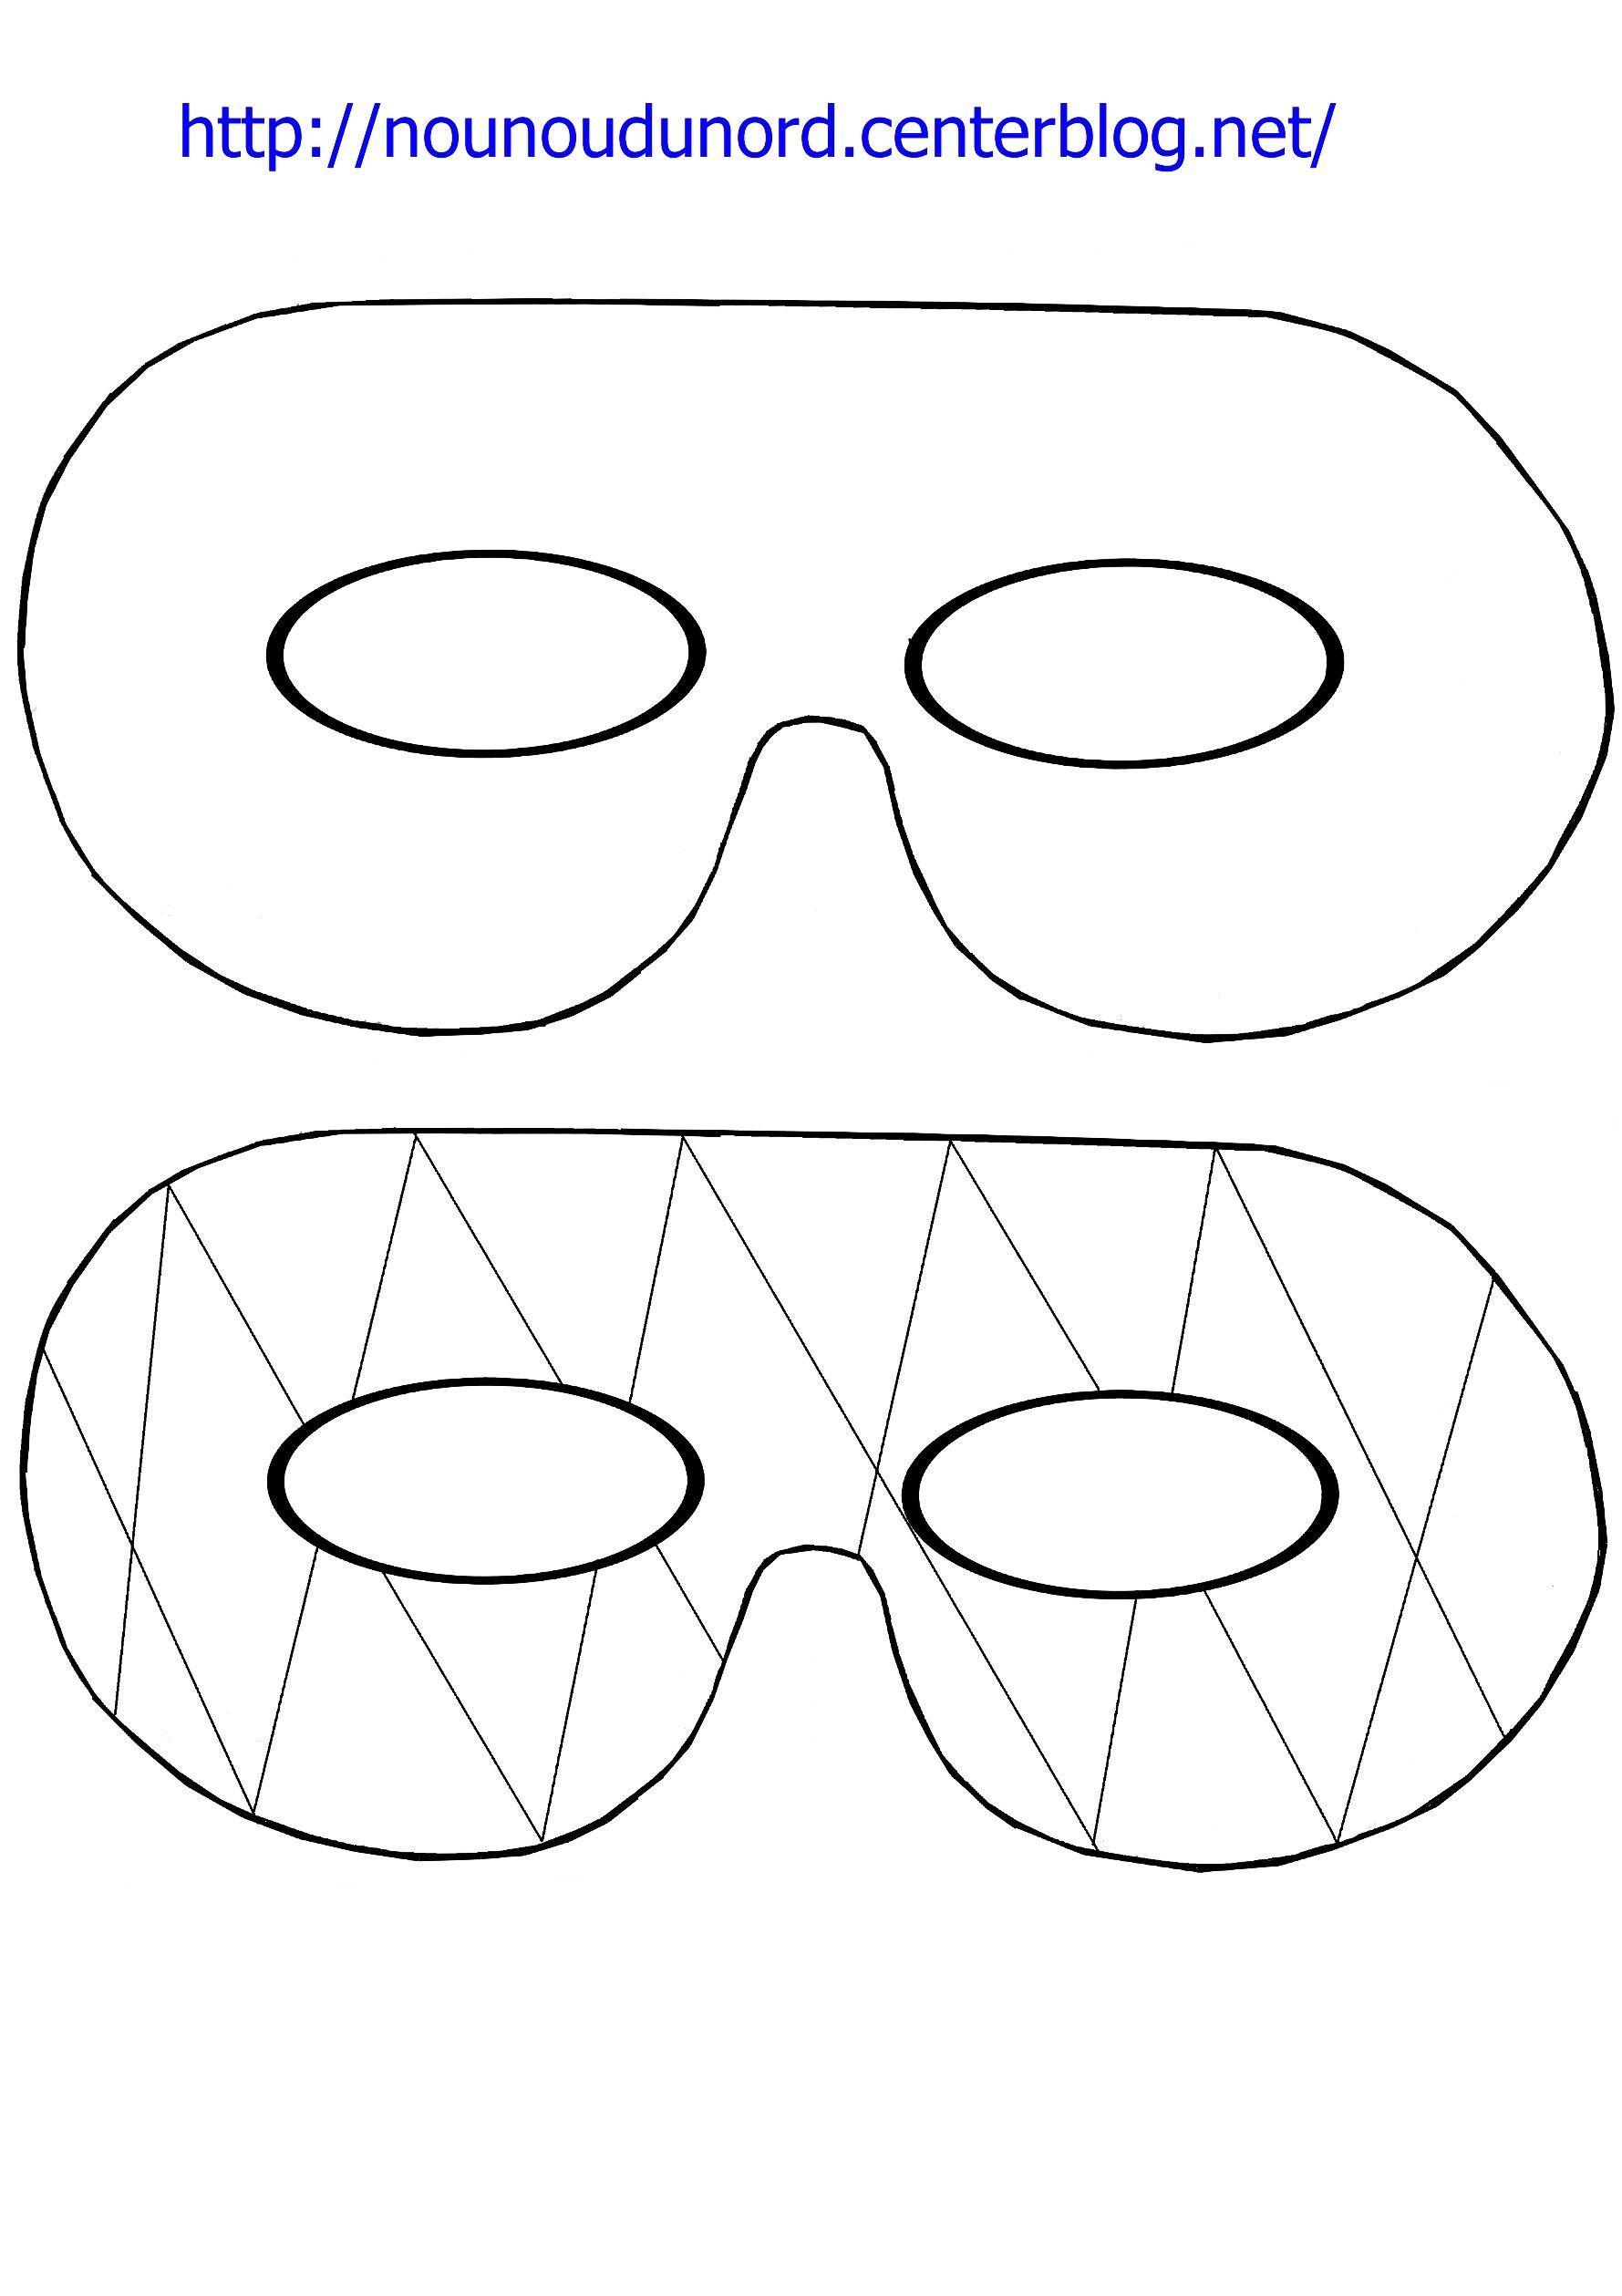 Masque Simple Et Arlequin À Imprimer encequiconcerne Arlequin A Colorier